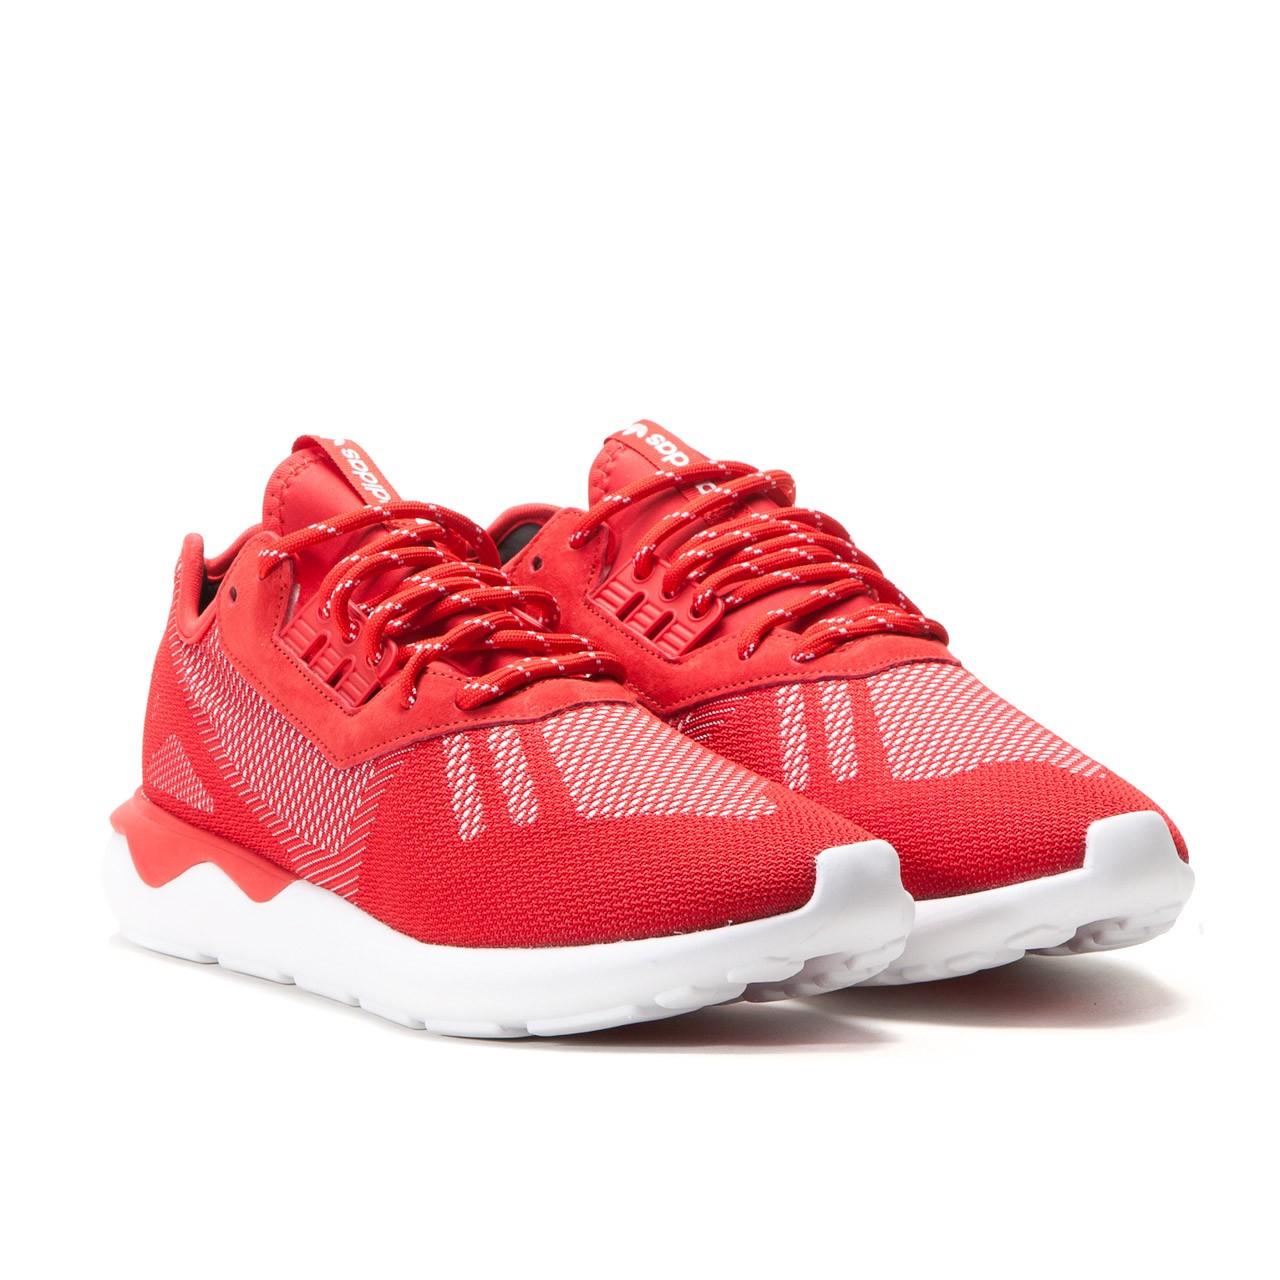 adidas-tubular-runner-weave-scarlet-2